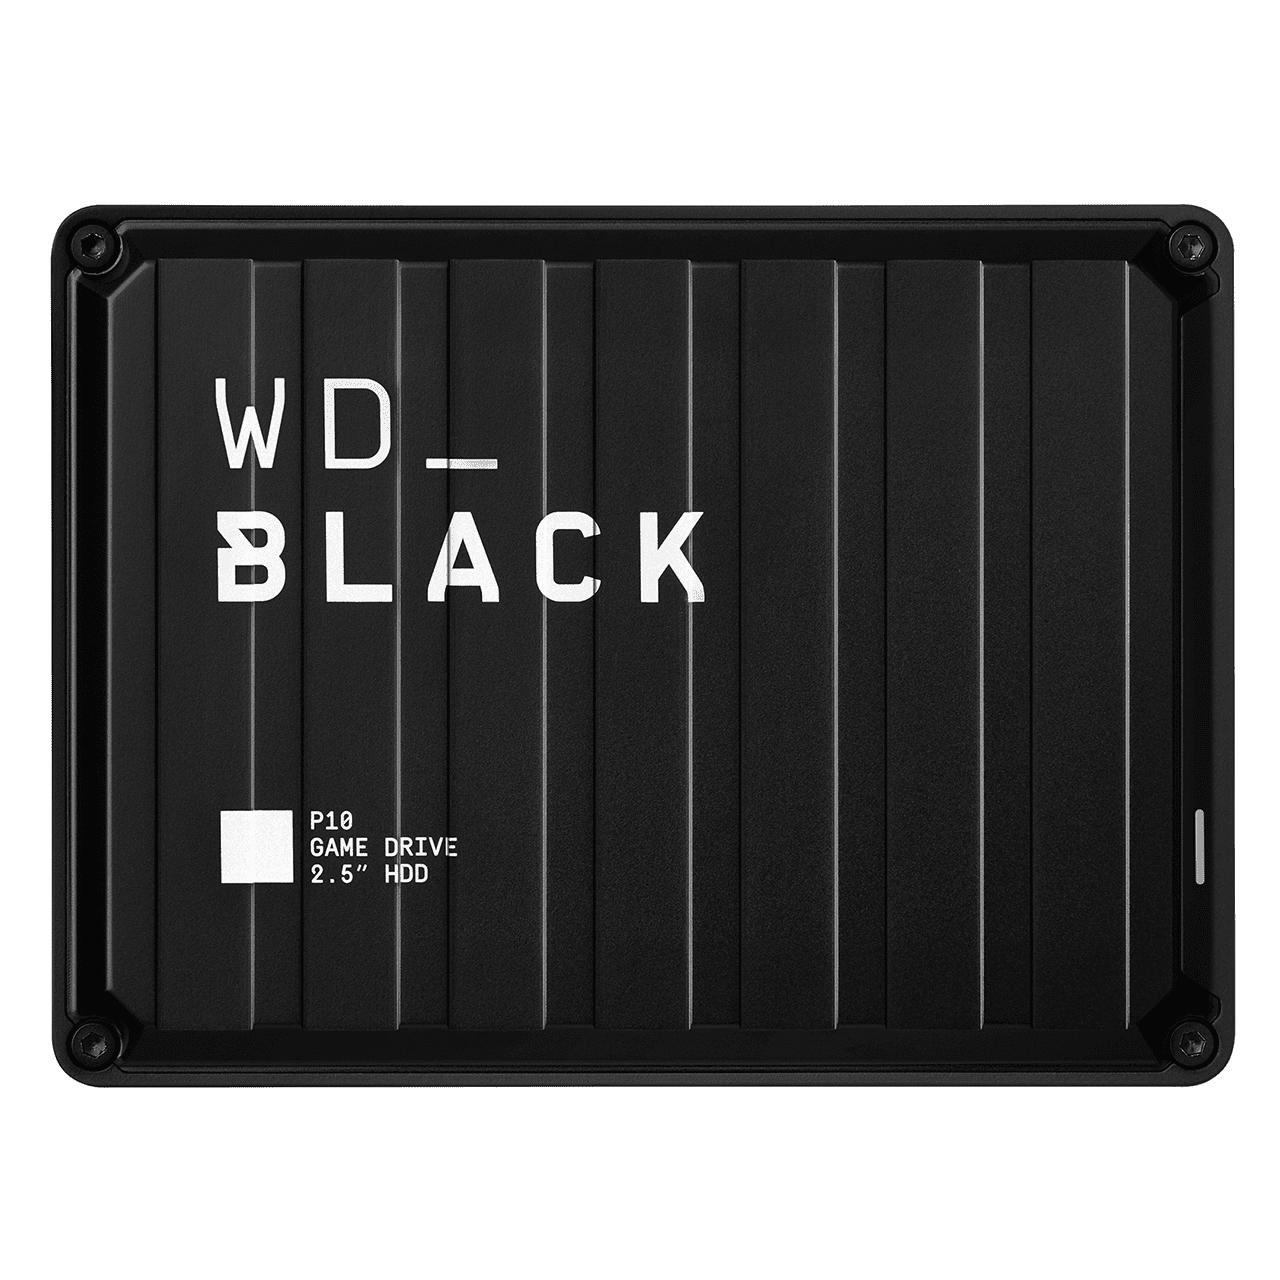 WD Black P10 Game Drive 4TB Black External Hard Drive